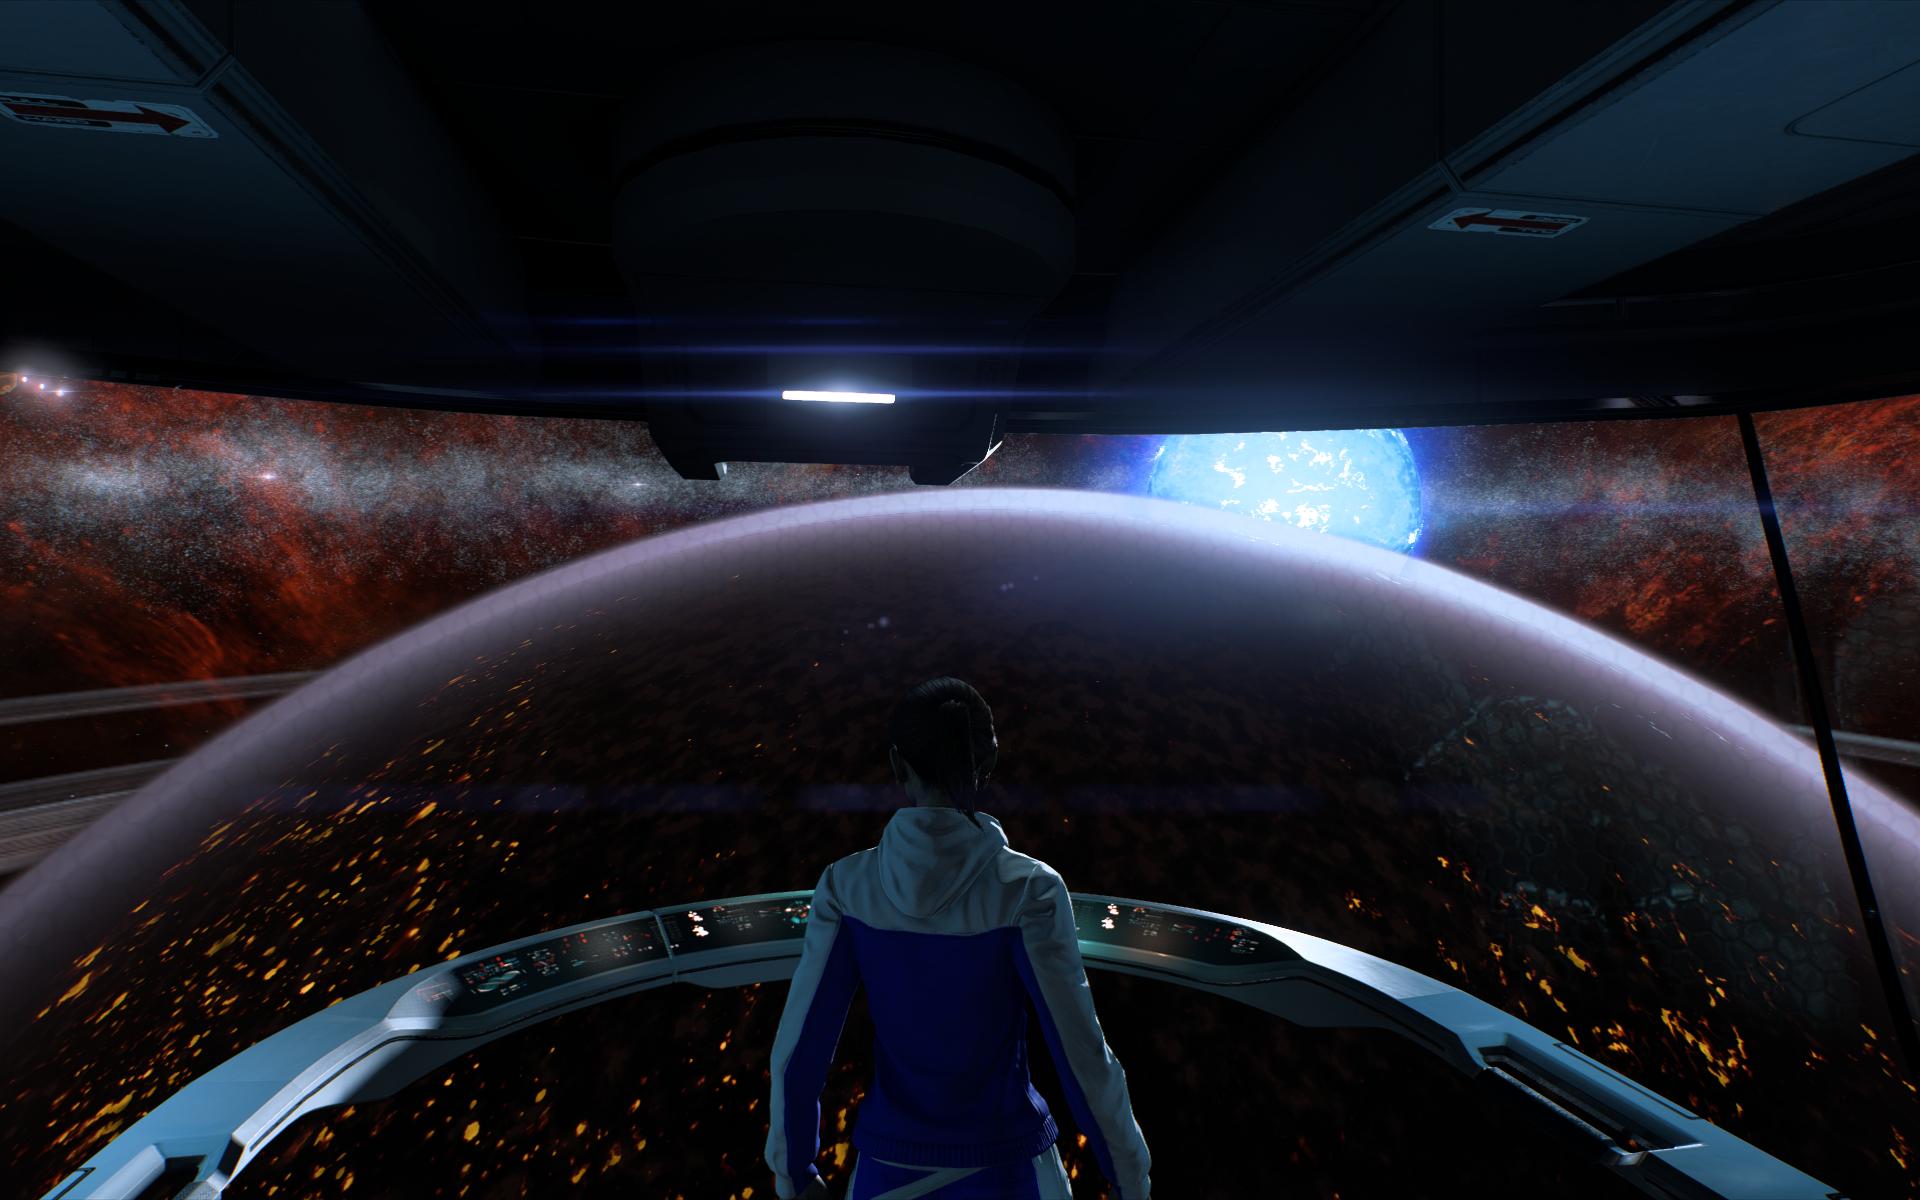 Mass Effect Andromeda Screenshot  - 17.35.39.12.png - Mass Effect: Andromeda